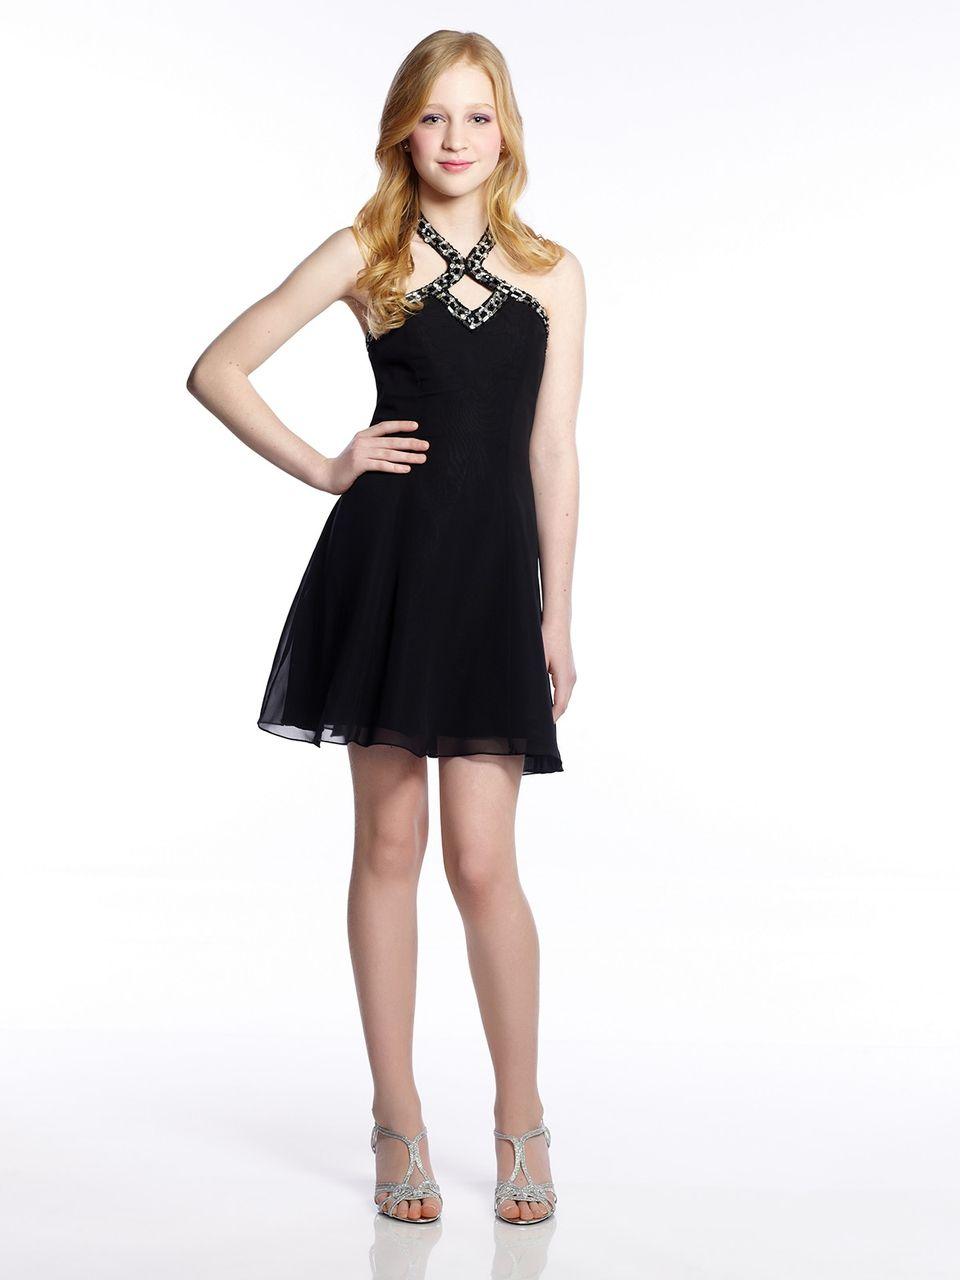 Lexie Girls Cocktail Dress Tw21541 Junior Party Dresses Dresses For Tweens Charmeuse Dress [ 1280 x 960 Pixel ]